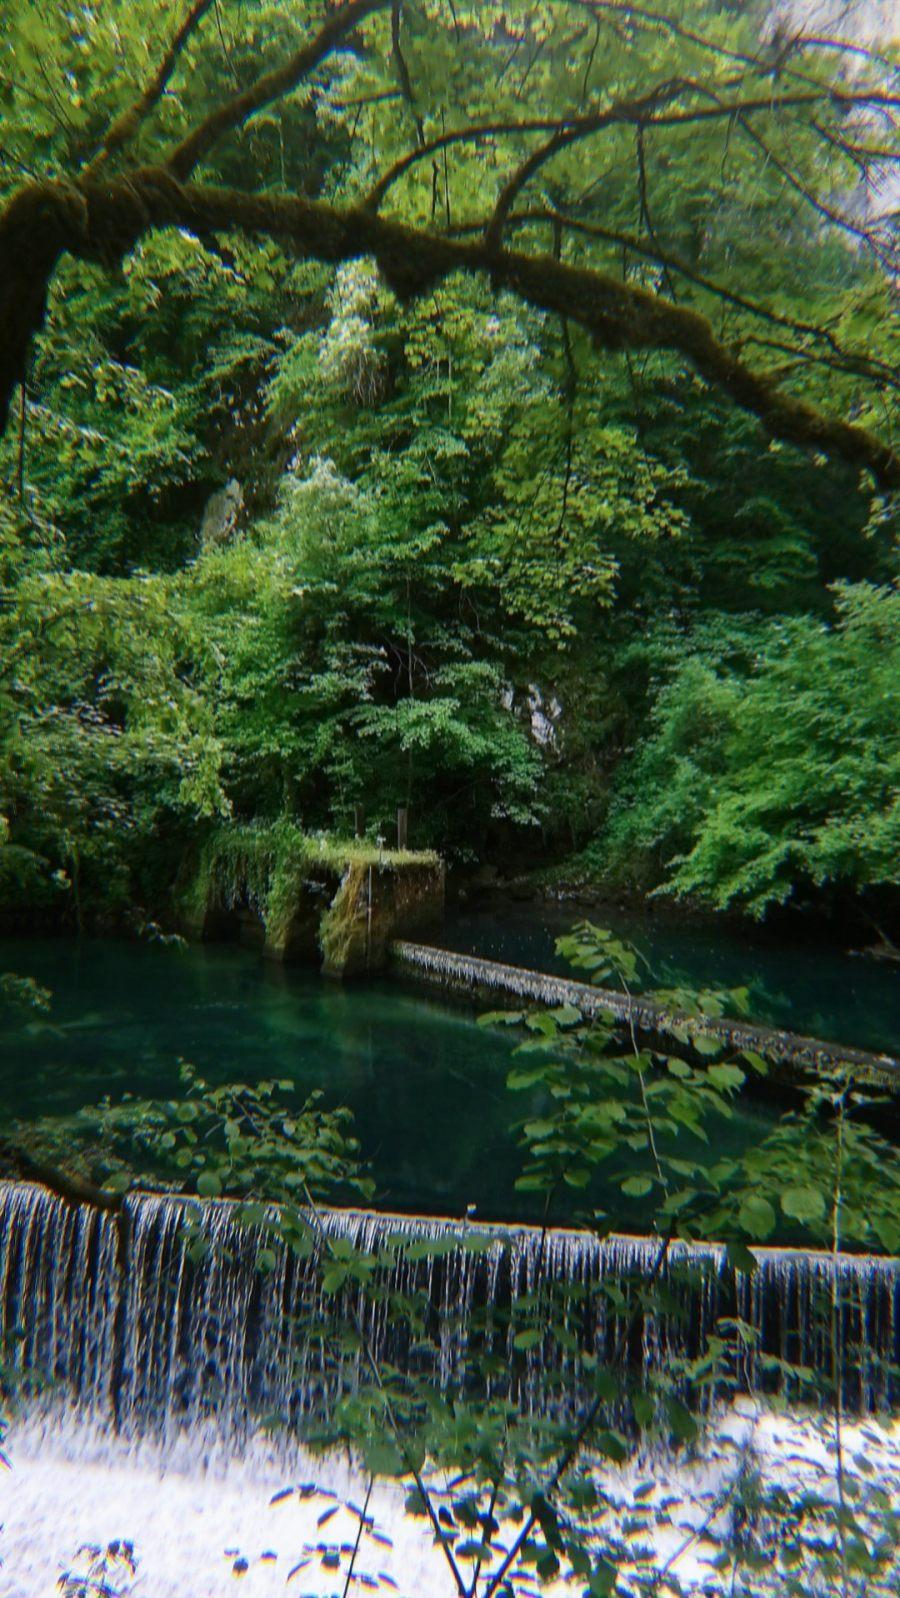 Natural phenomenon - the spring of Krušnica